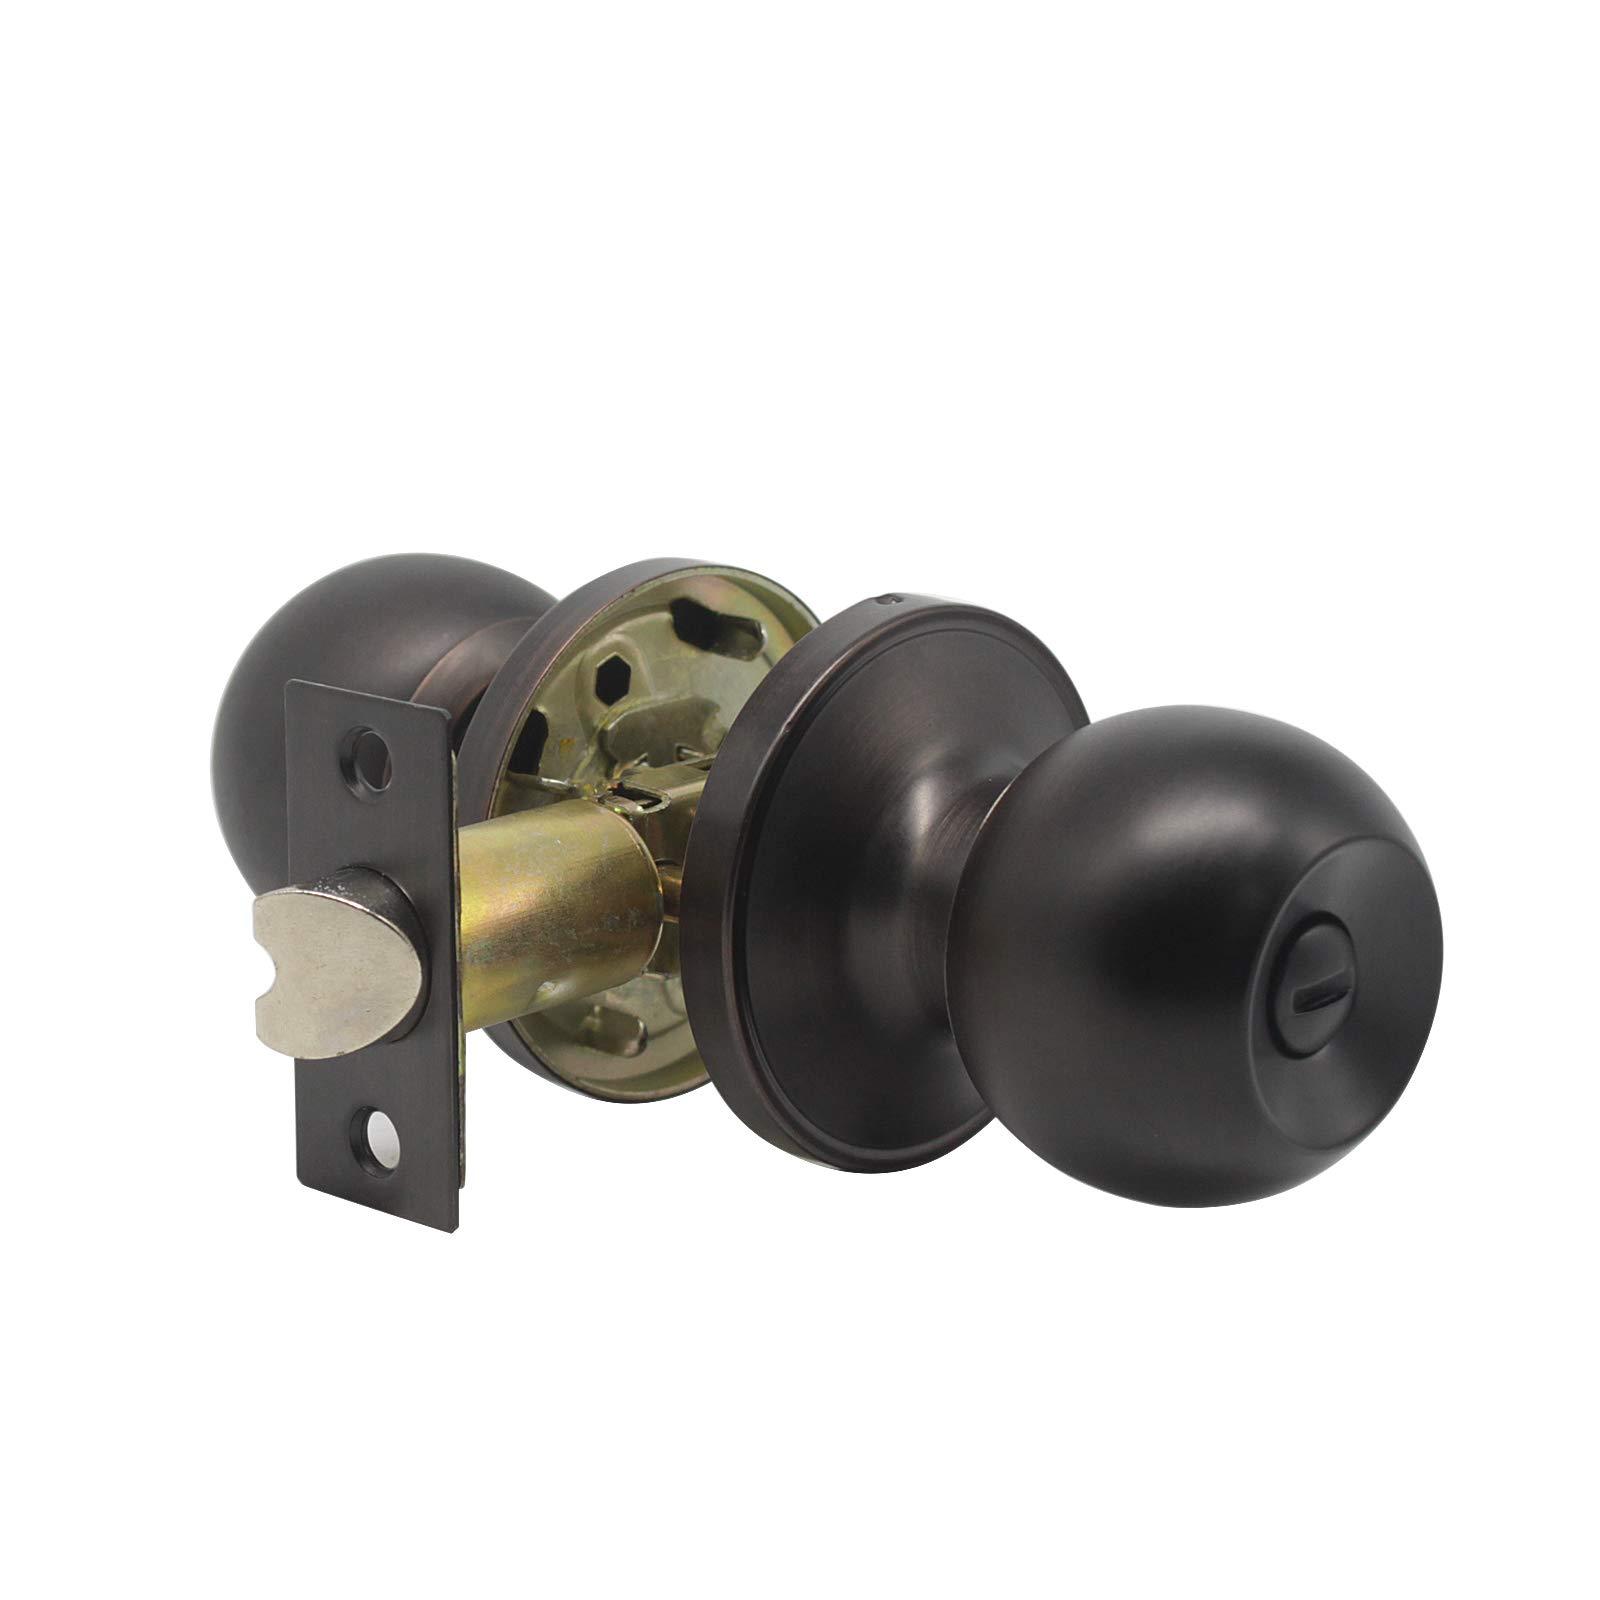 8 Pack Probrico Interior Round Privacy Keyless Door Knobs Door Lock Lockset Without Key Doorknobs Oil Rubbed Bronze for Bedroom and Bathroom-Door Knob 607 by Probrico (Image #3)